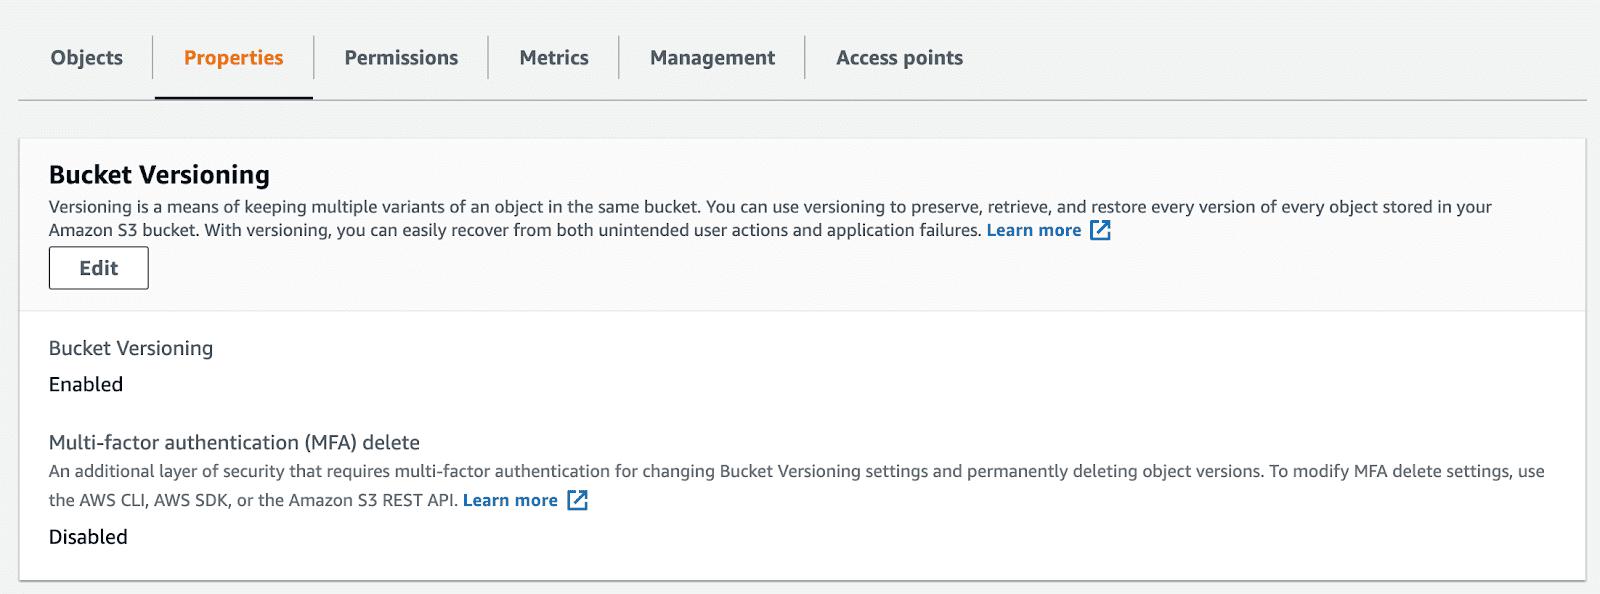 Change advanced settings for your bucket